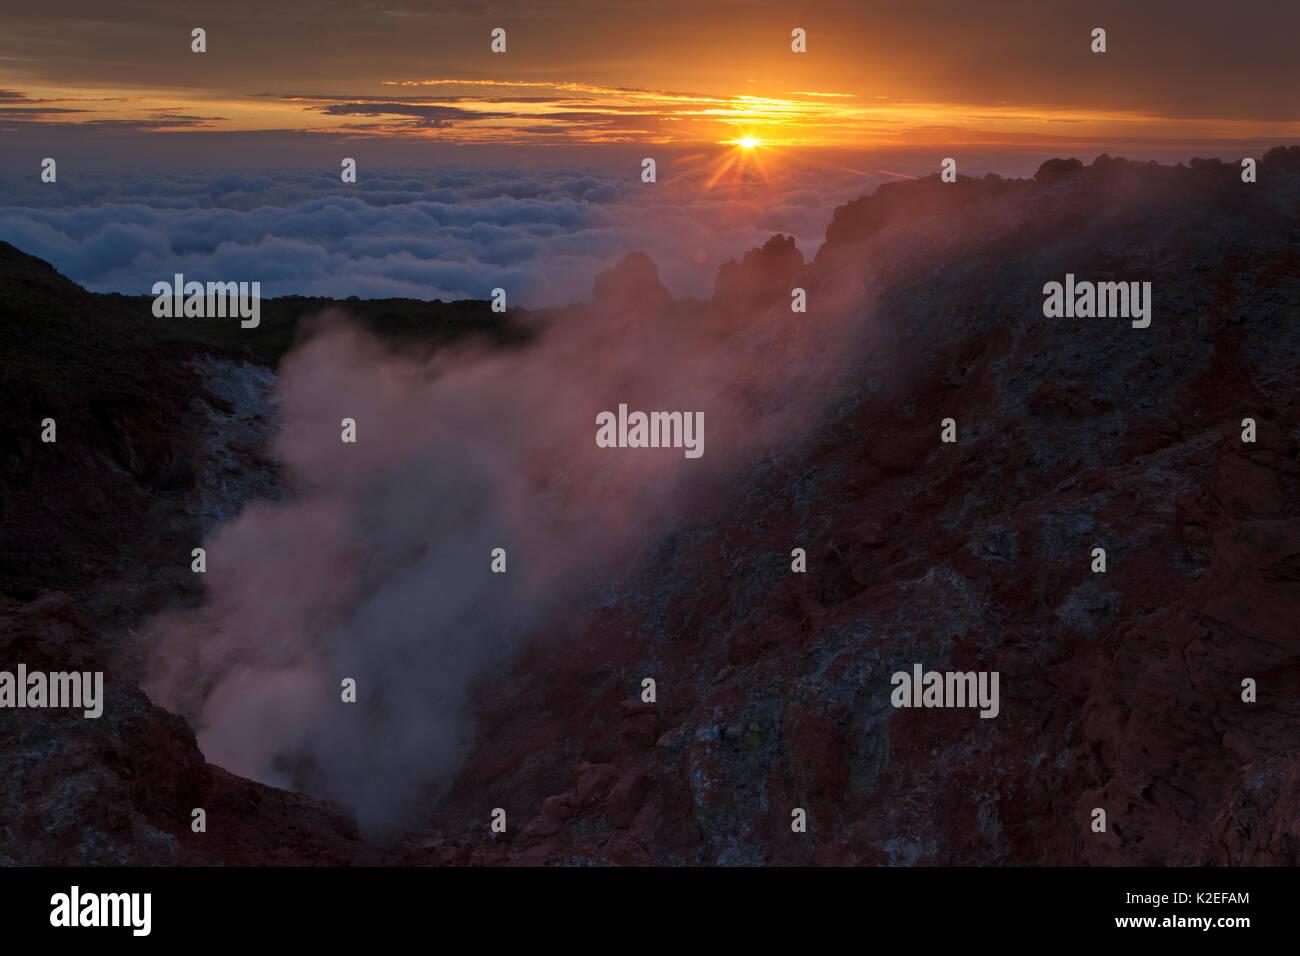 Fumarole, Socorro Island, Revillagigedo Archipel Biosphärenreservat/Inselgruppe de Revillagigedo UNESCO Weltnaturerbe Stockfoto